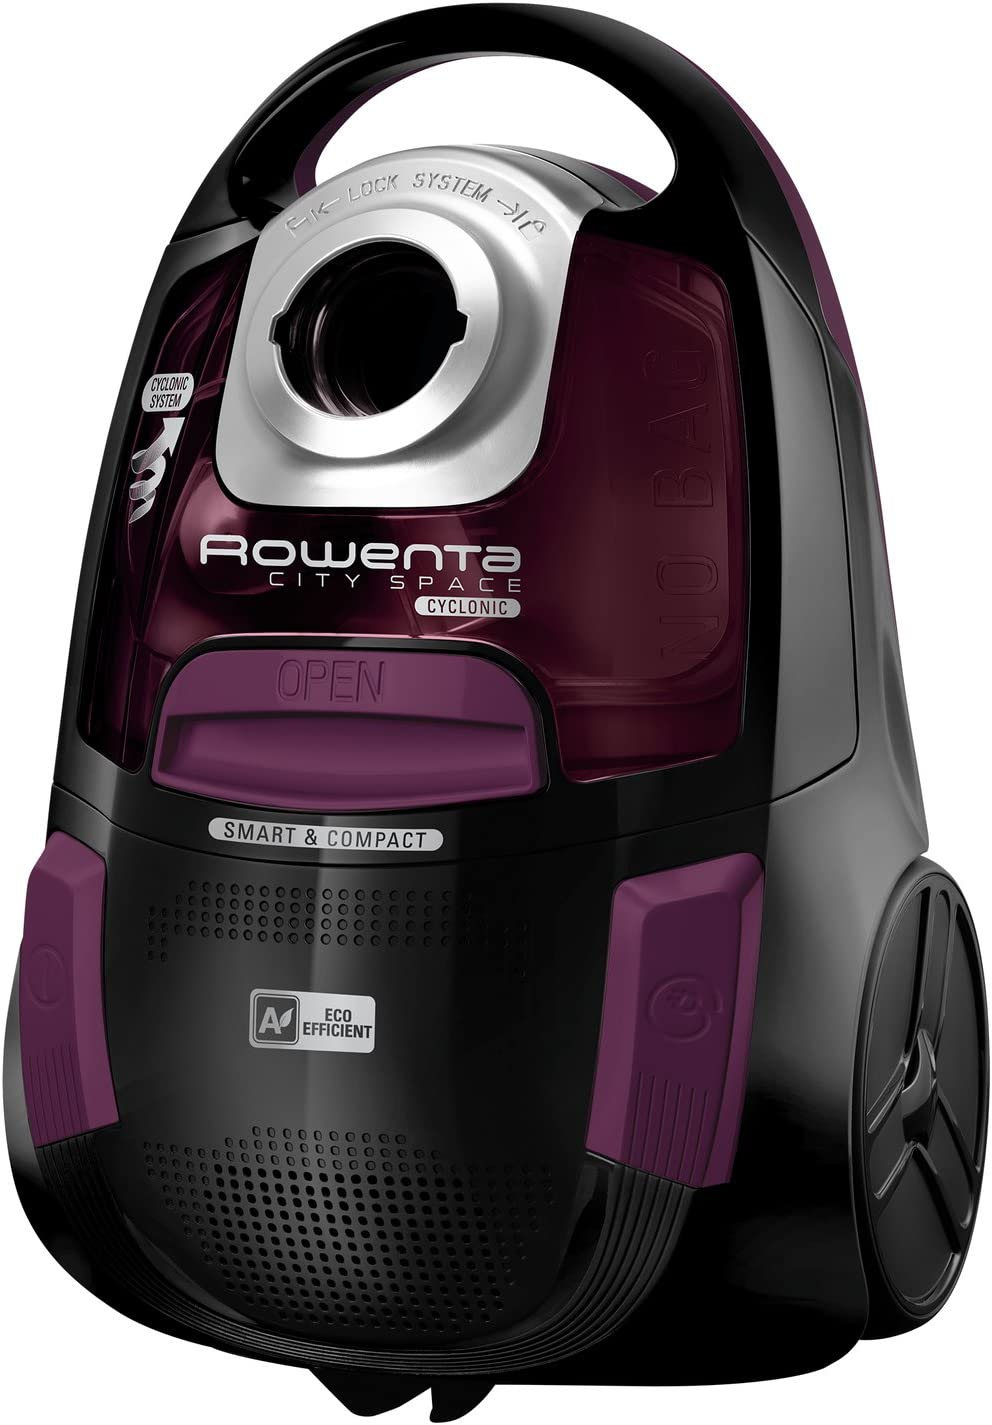 Rowenta City Space RO2759 - Aspiradora (750 W, Aspiradora cilíndrica, Secar, Sin Bolsa, 1,2 L, Ciclónico): Amazon.es: Hogar